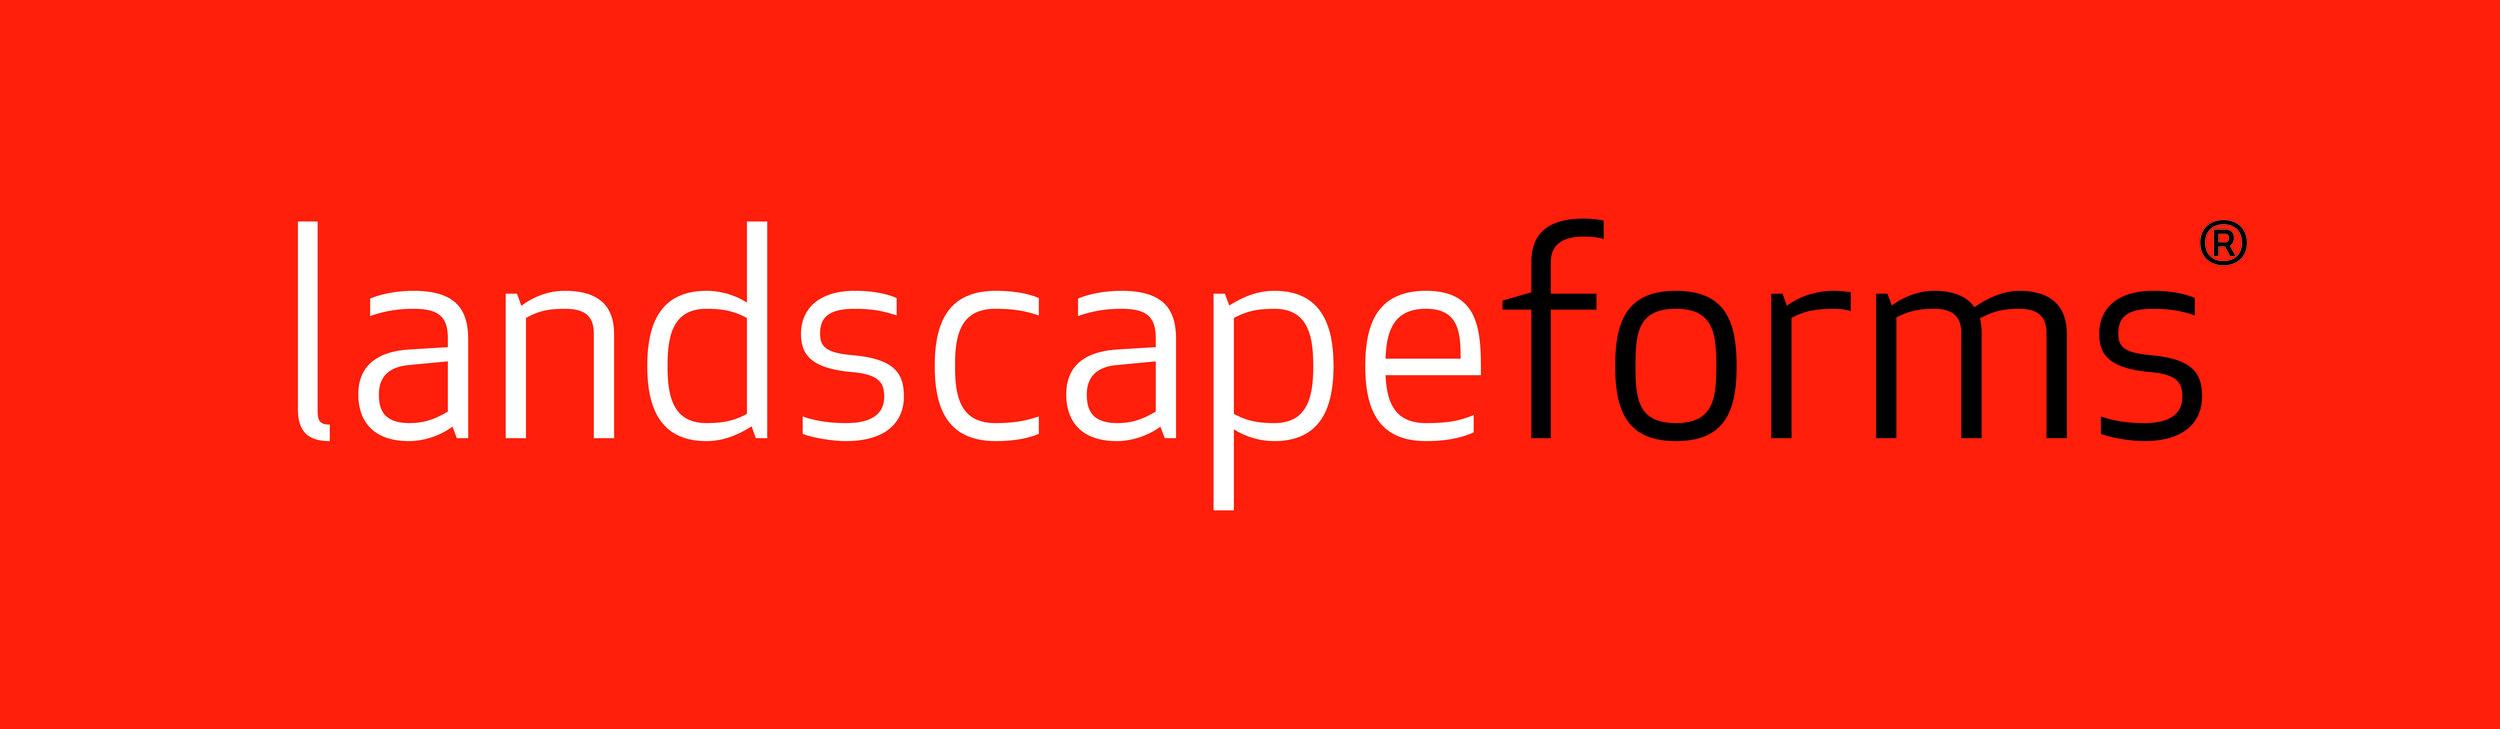 LF_new large logo_4c.jpg